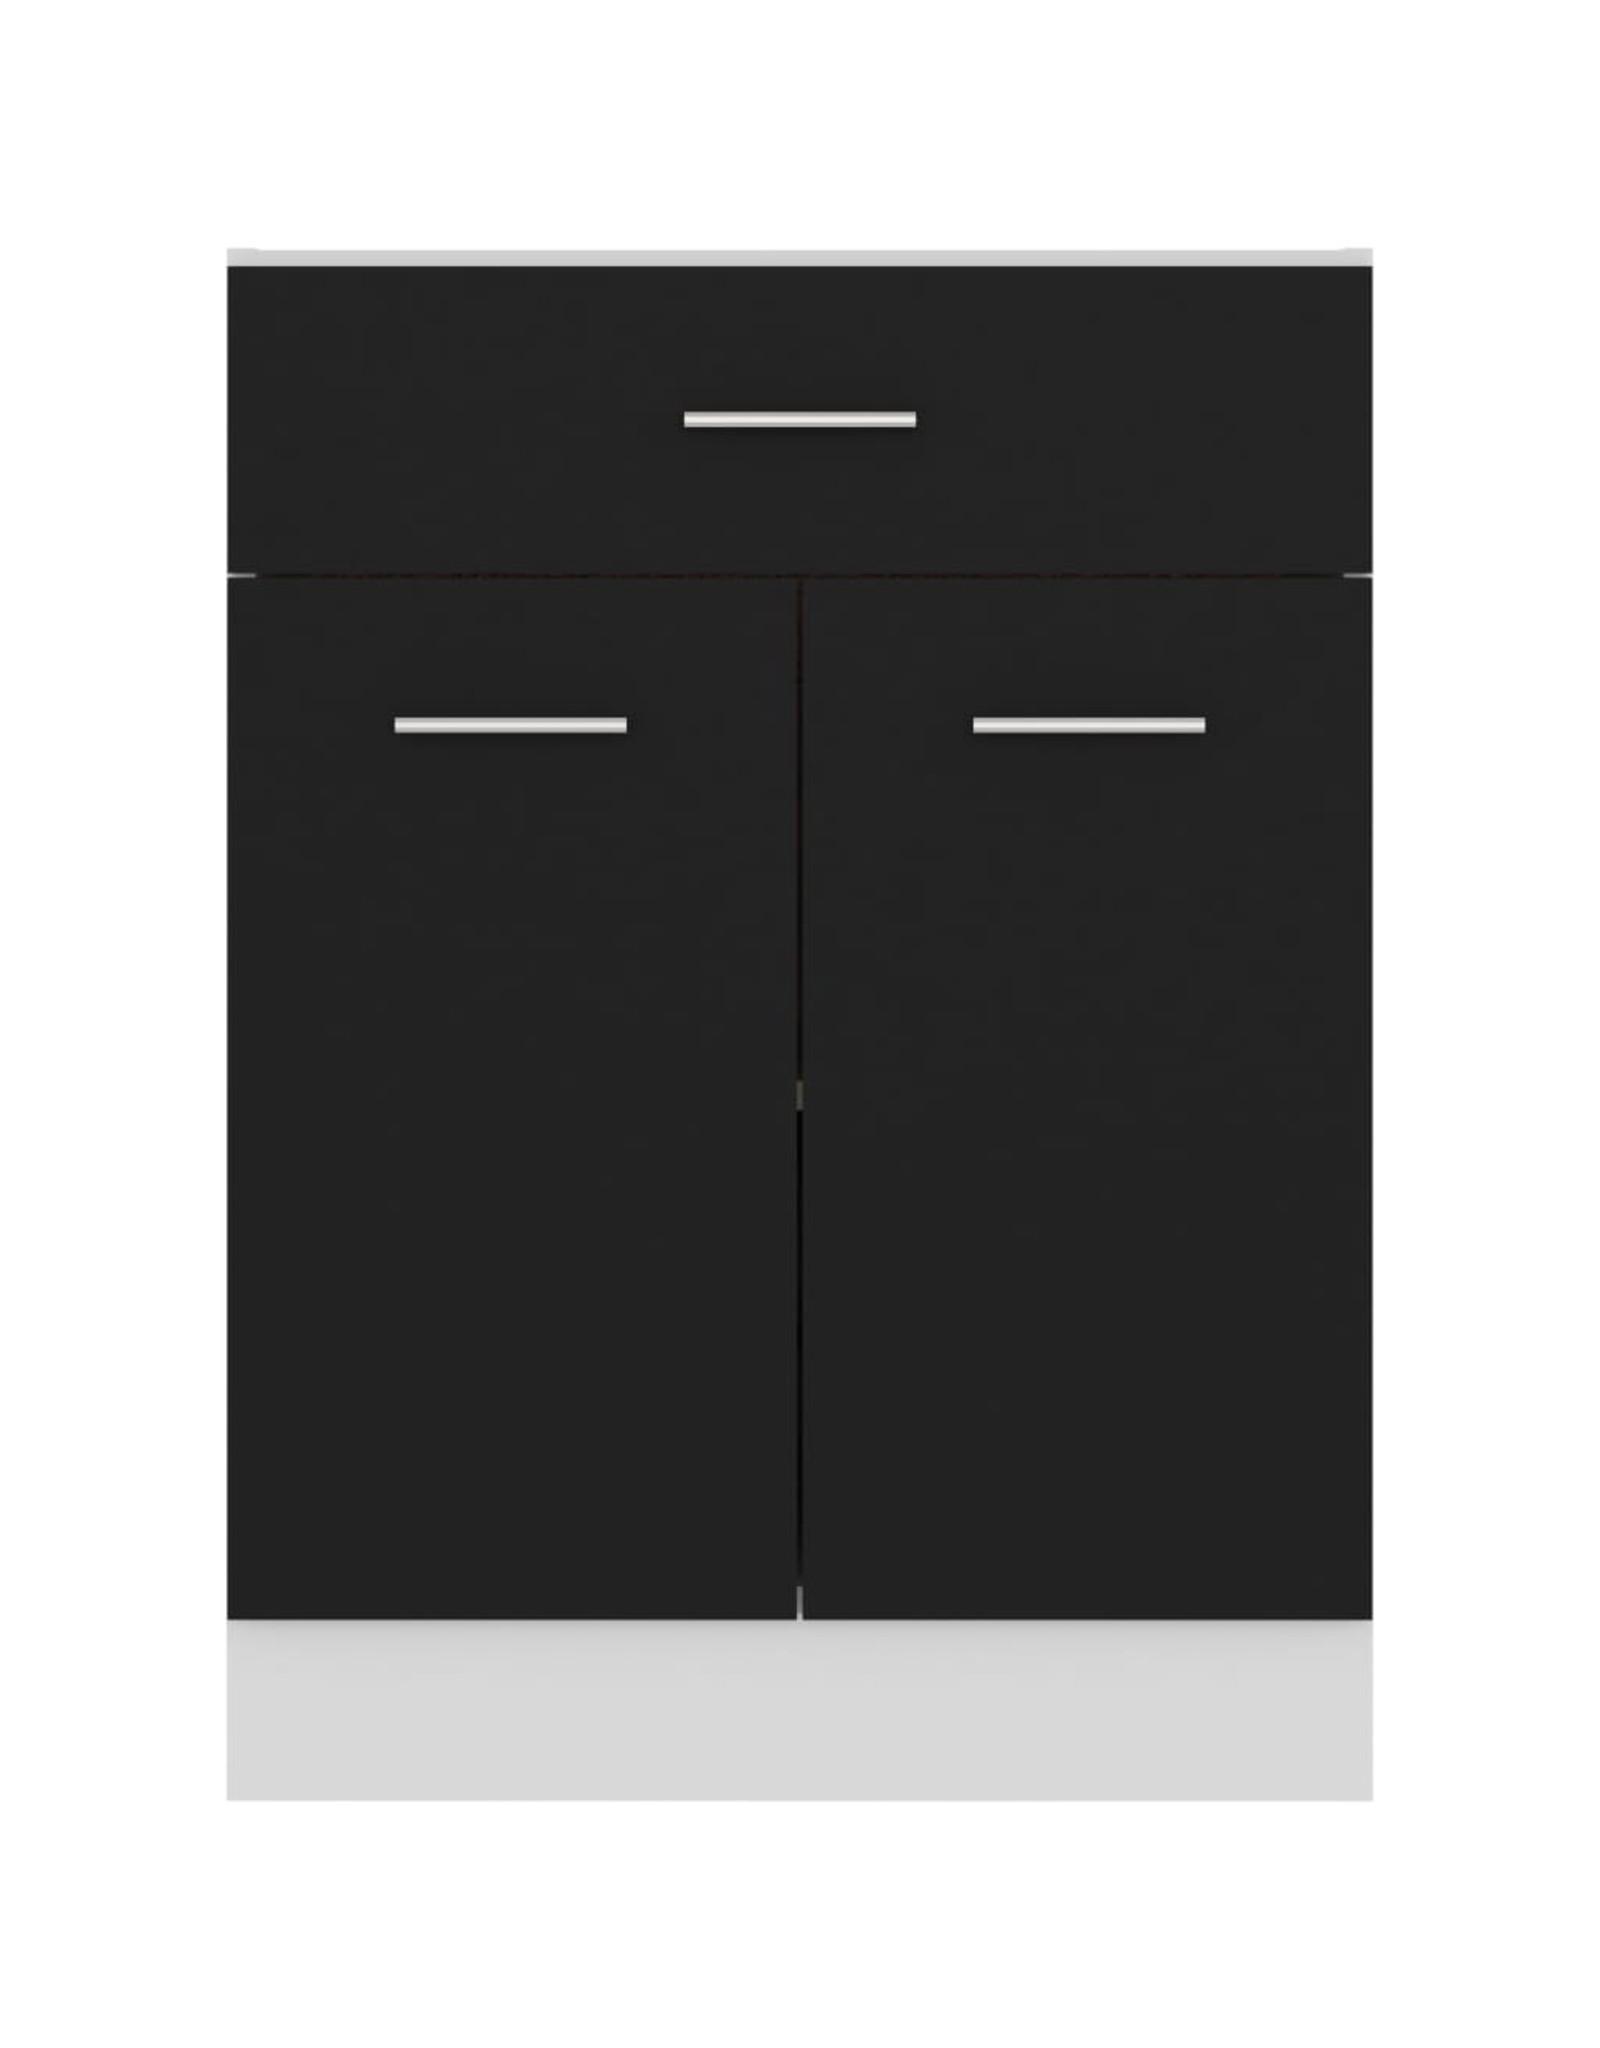 Onderkast met lade 60x46x81,5 cm spaanplaat zwart